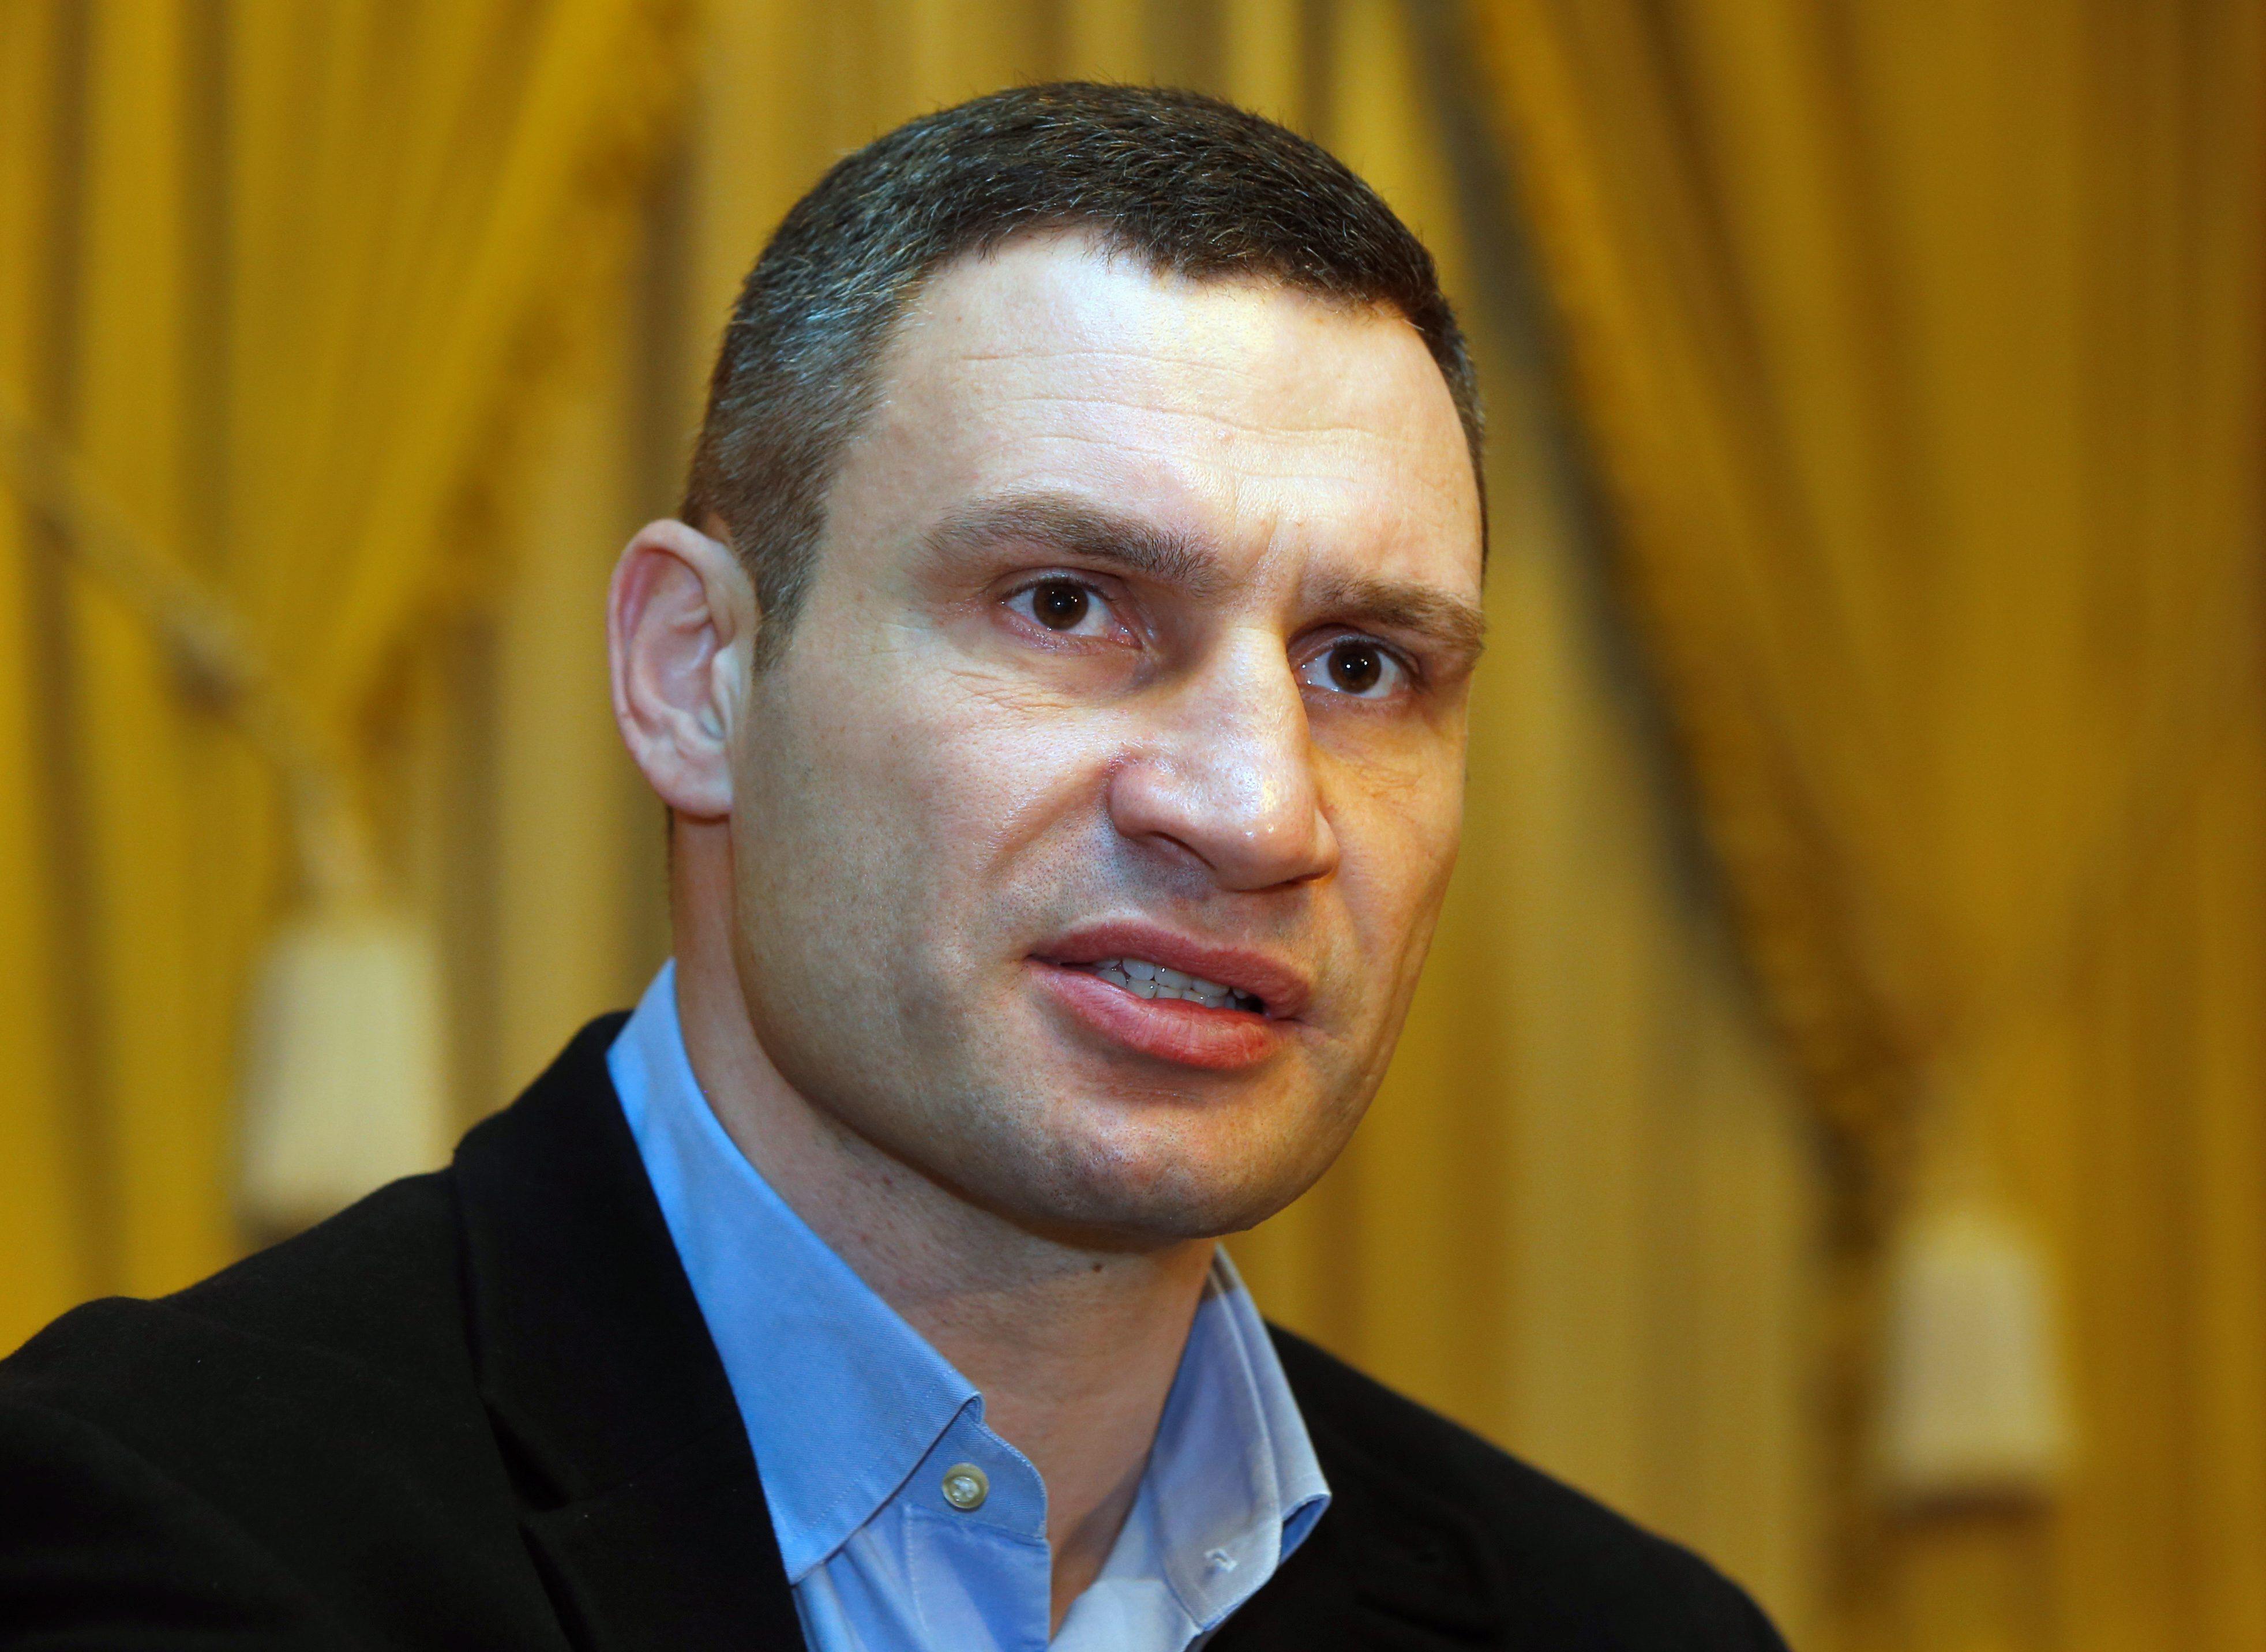 Vitali Klitschko failed to pronounce the word totalitarianism 05/25/2016